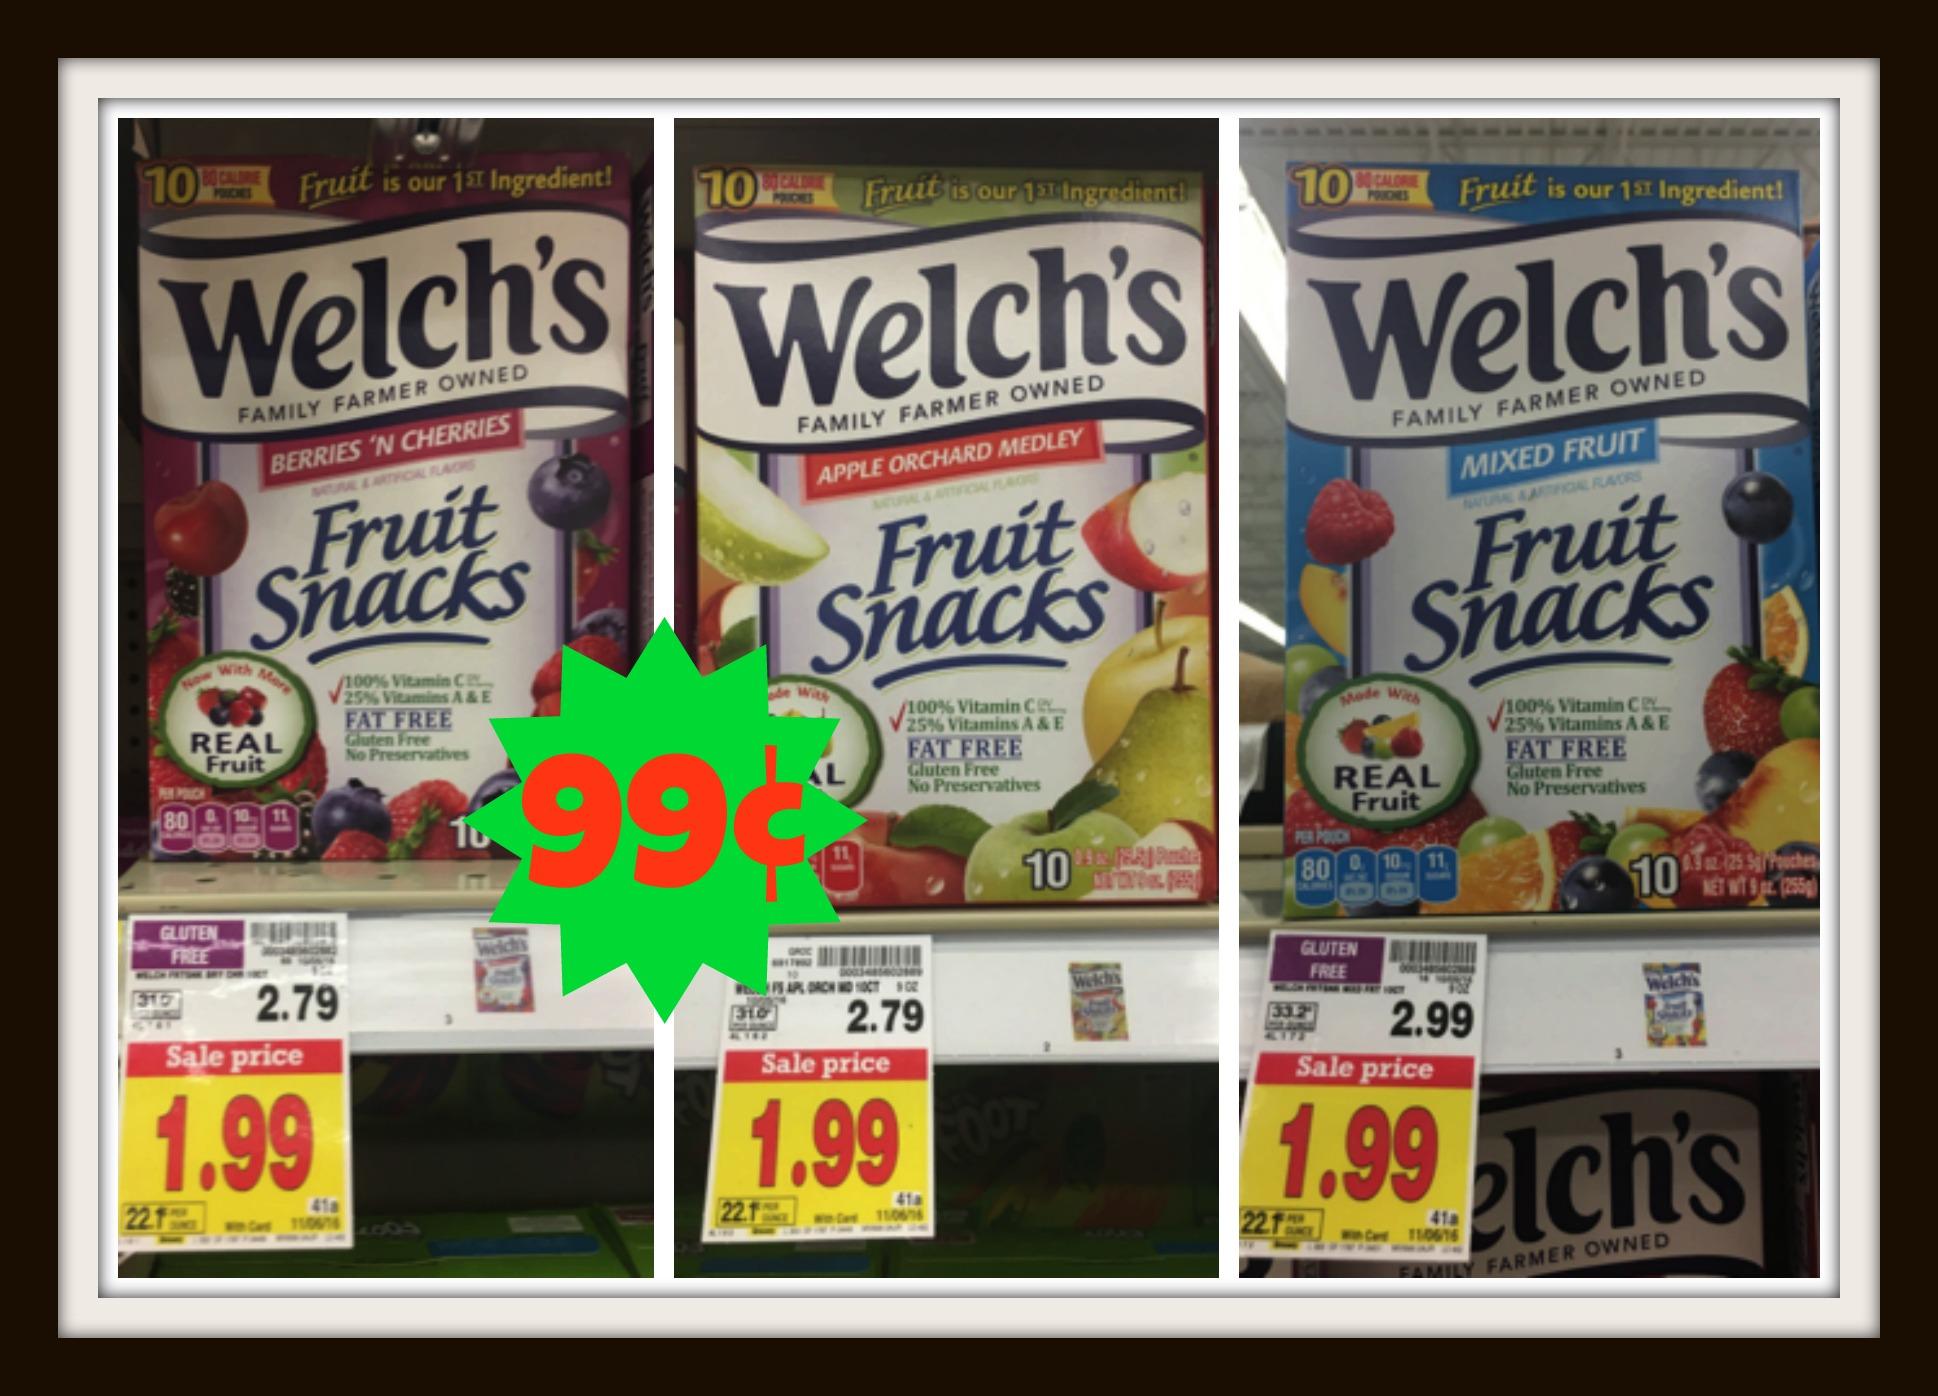 welchs-snacks20-image